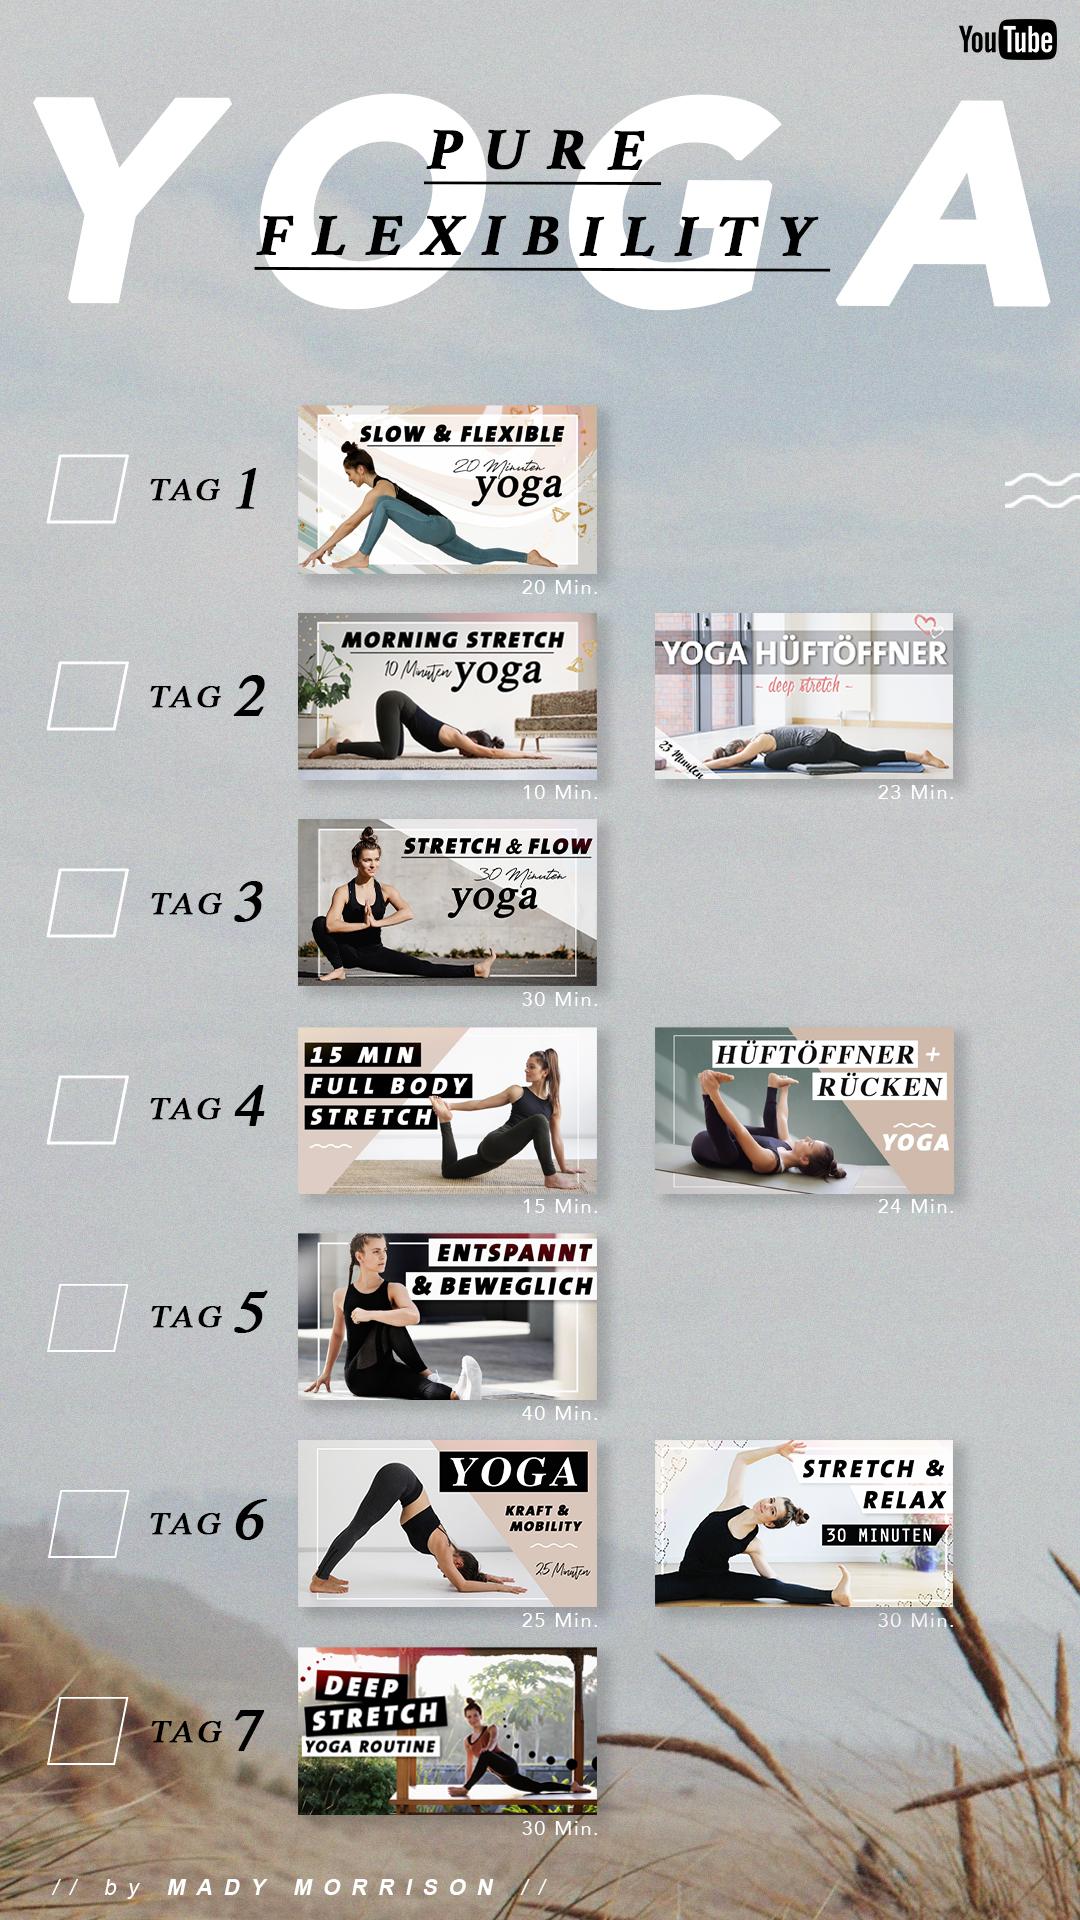 02-pure-flexibility-madymorrison-yoga